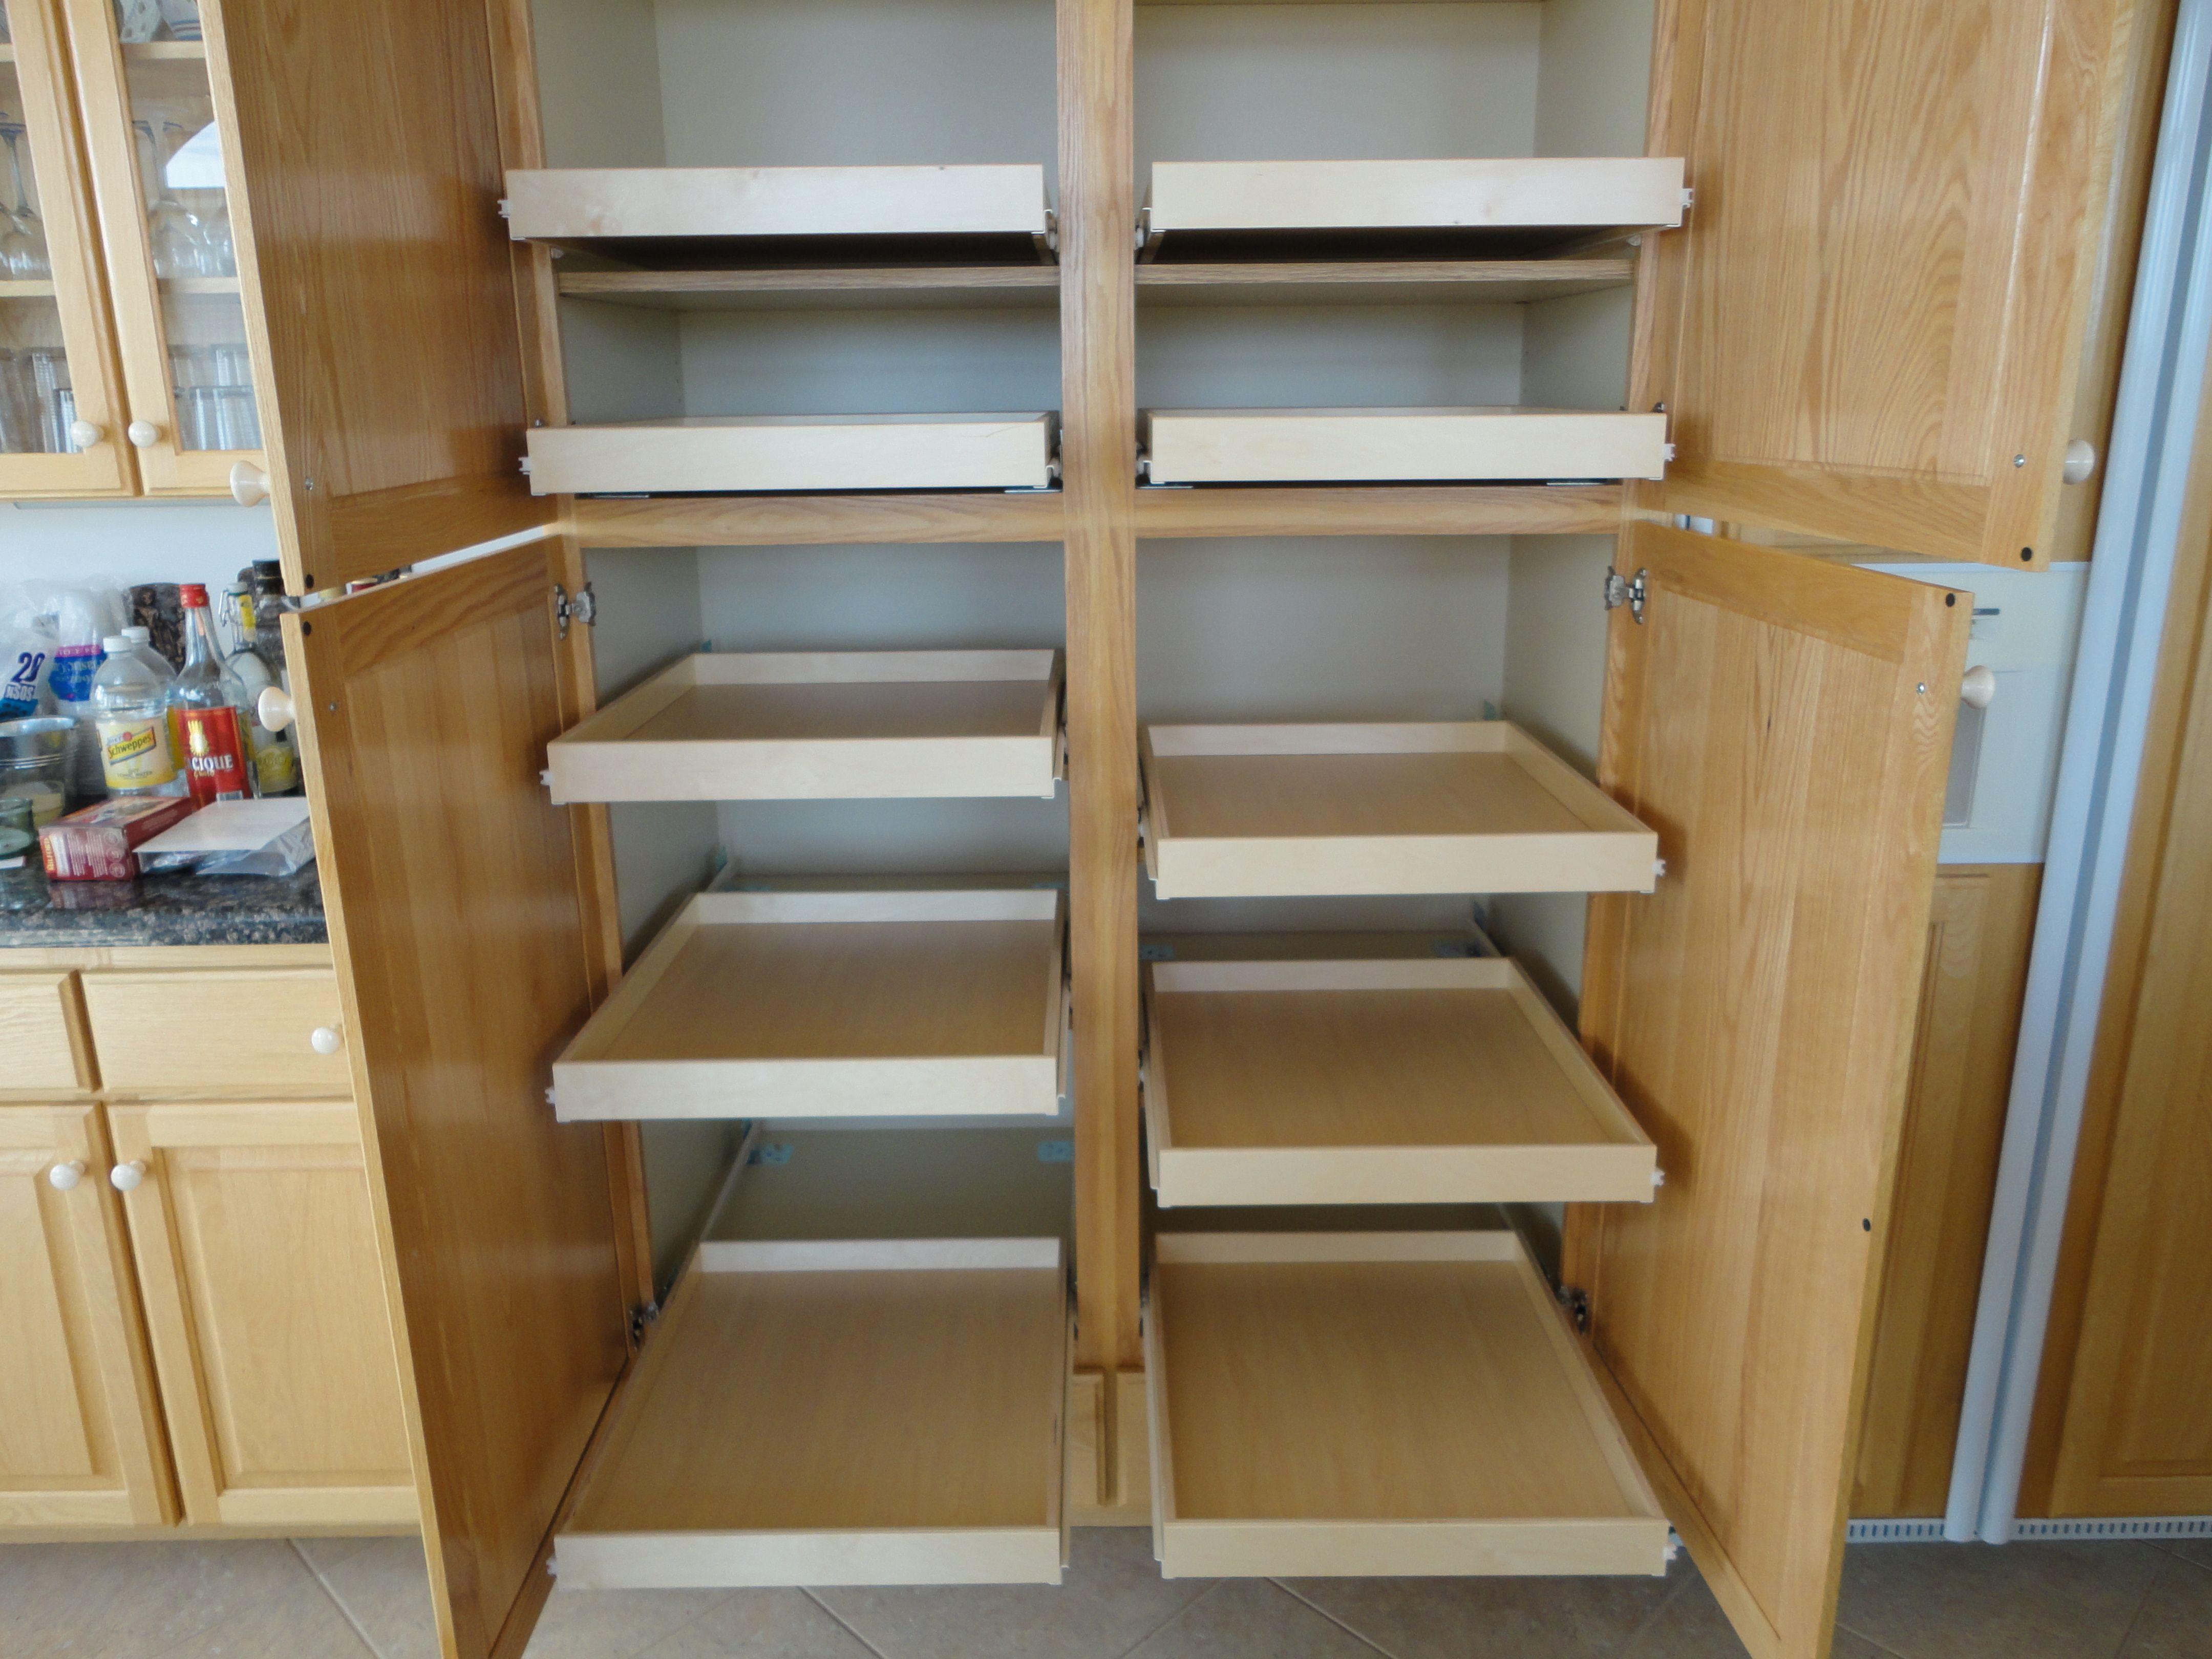 Not Found Slide Out Shelves Shelves Pantry Shelf